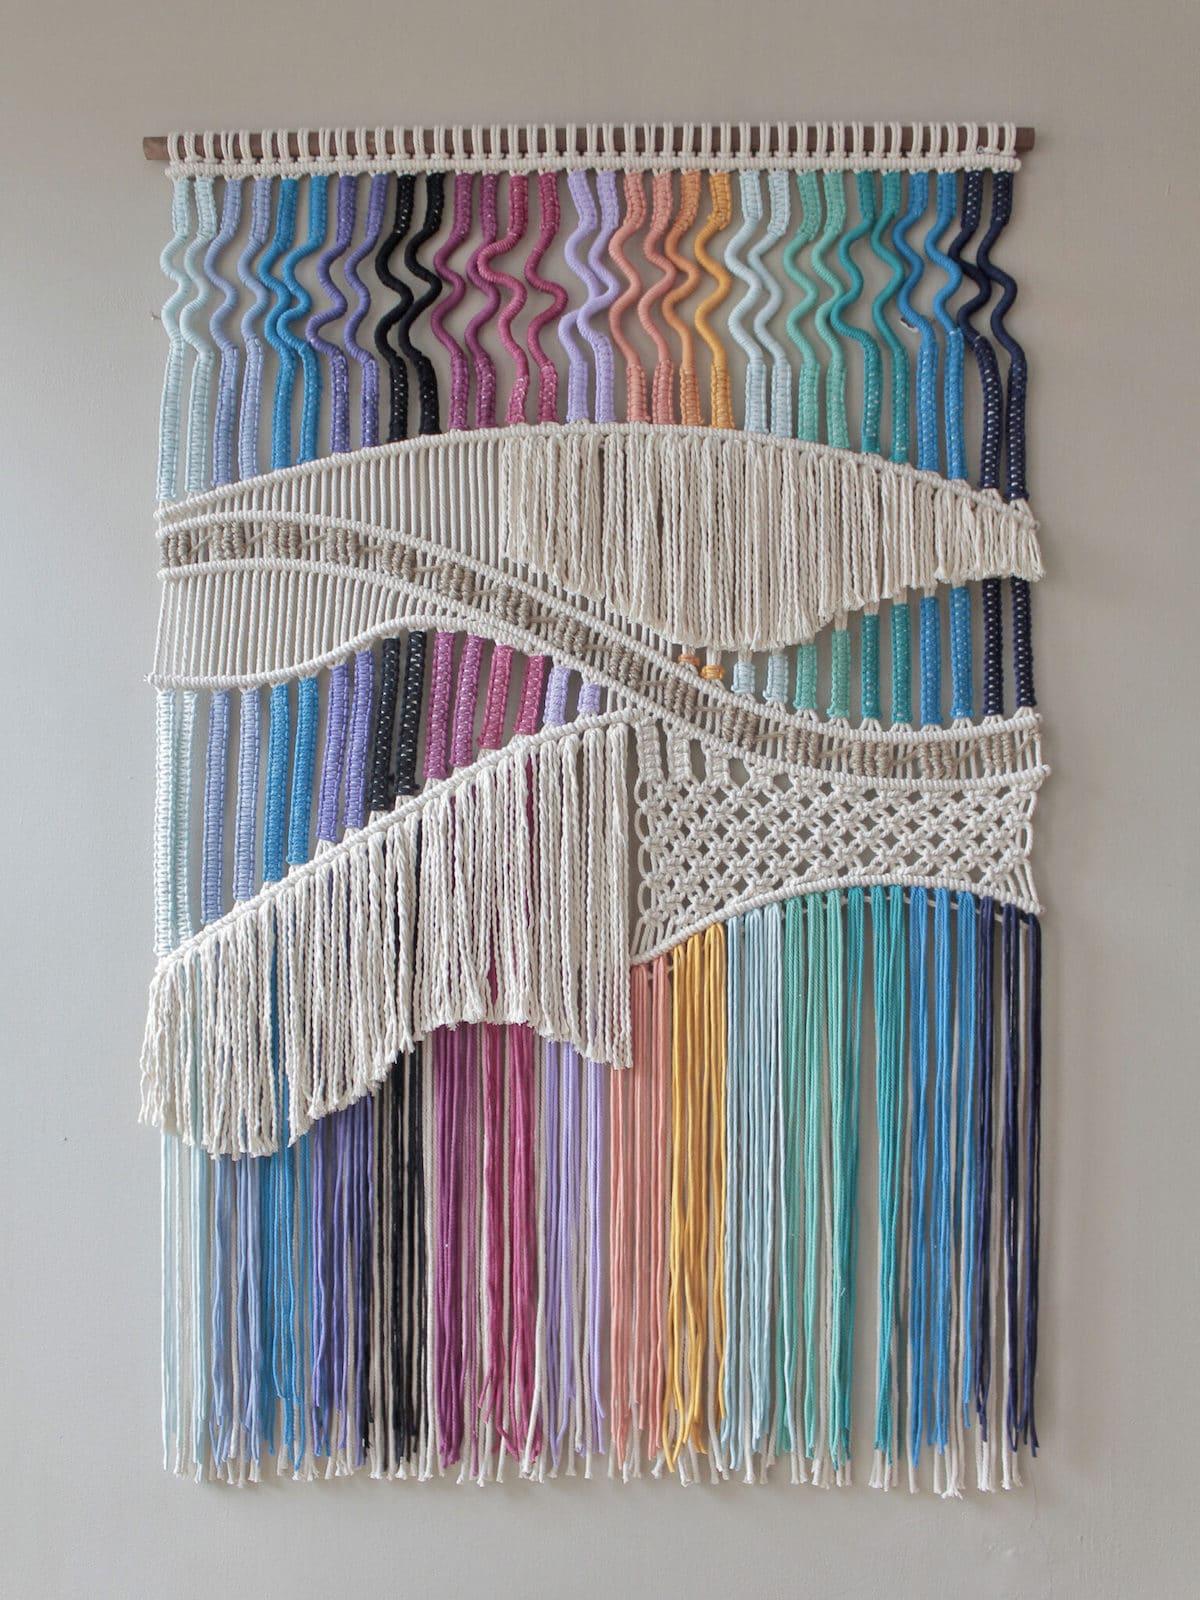 tapiz de macrame de colores por Agnes Hansella